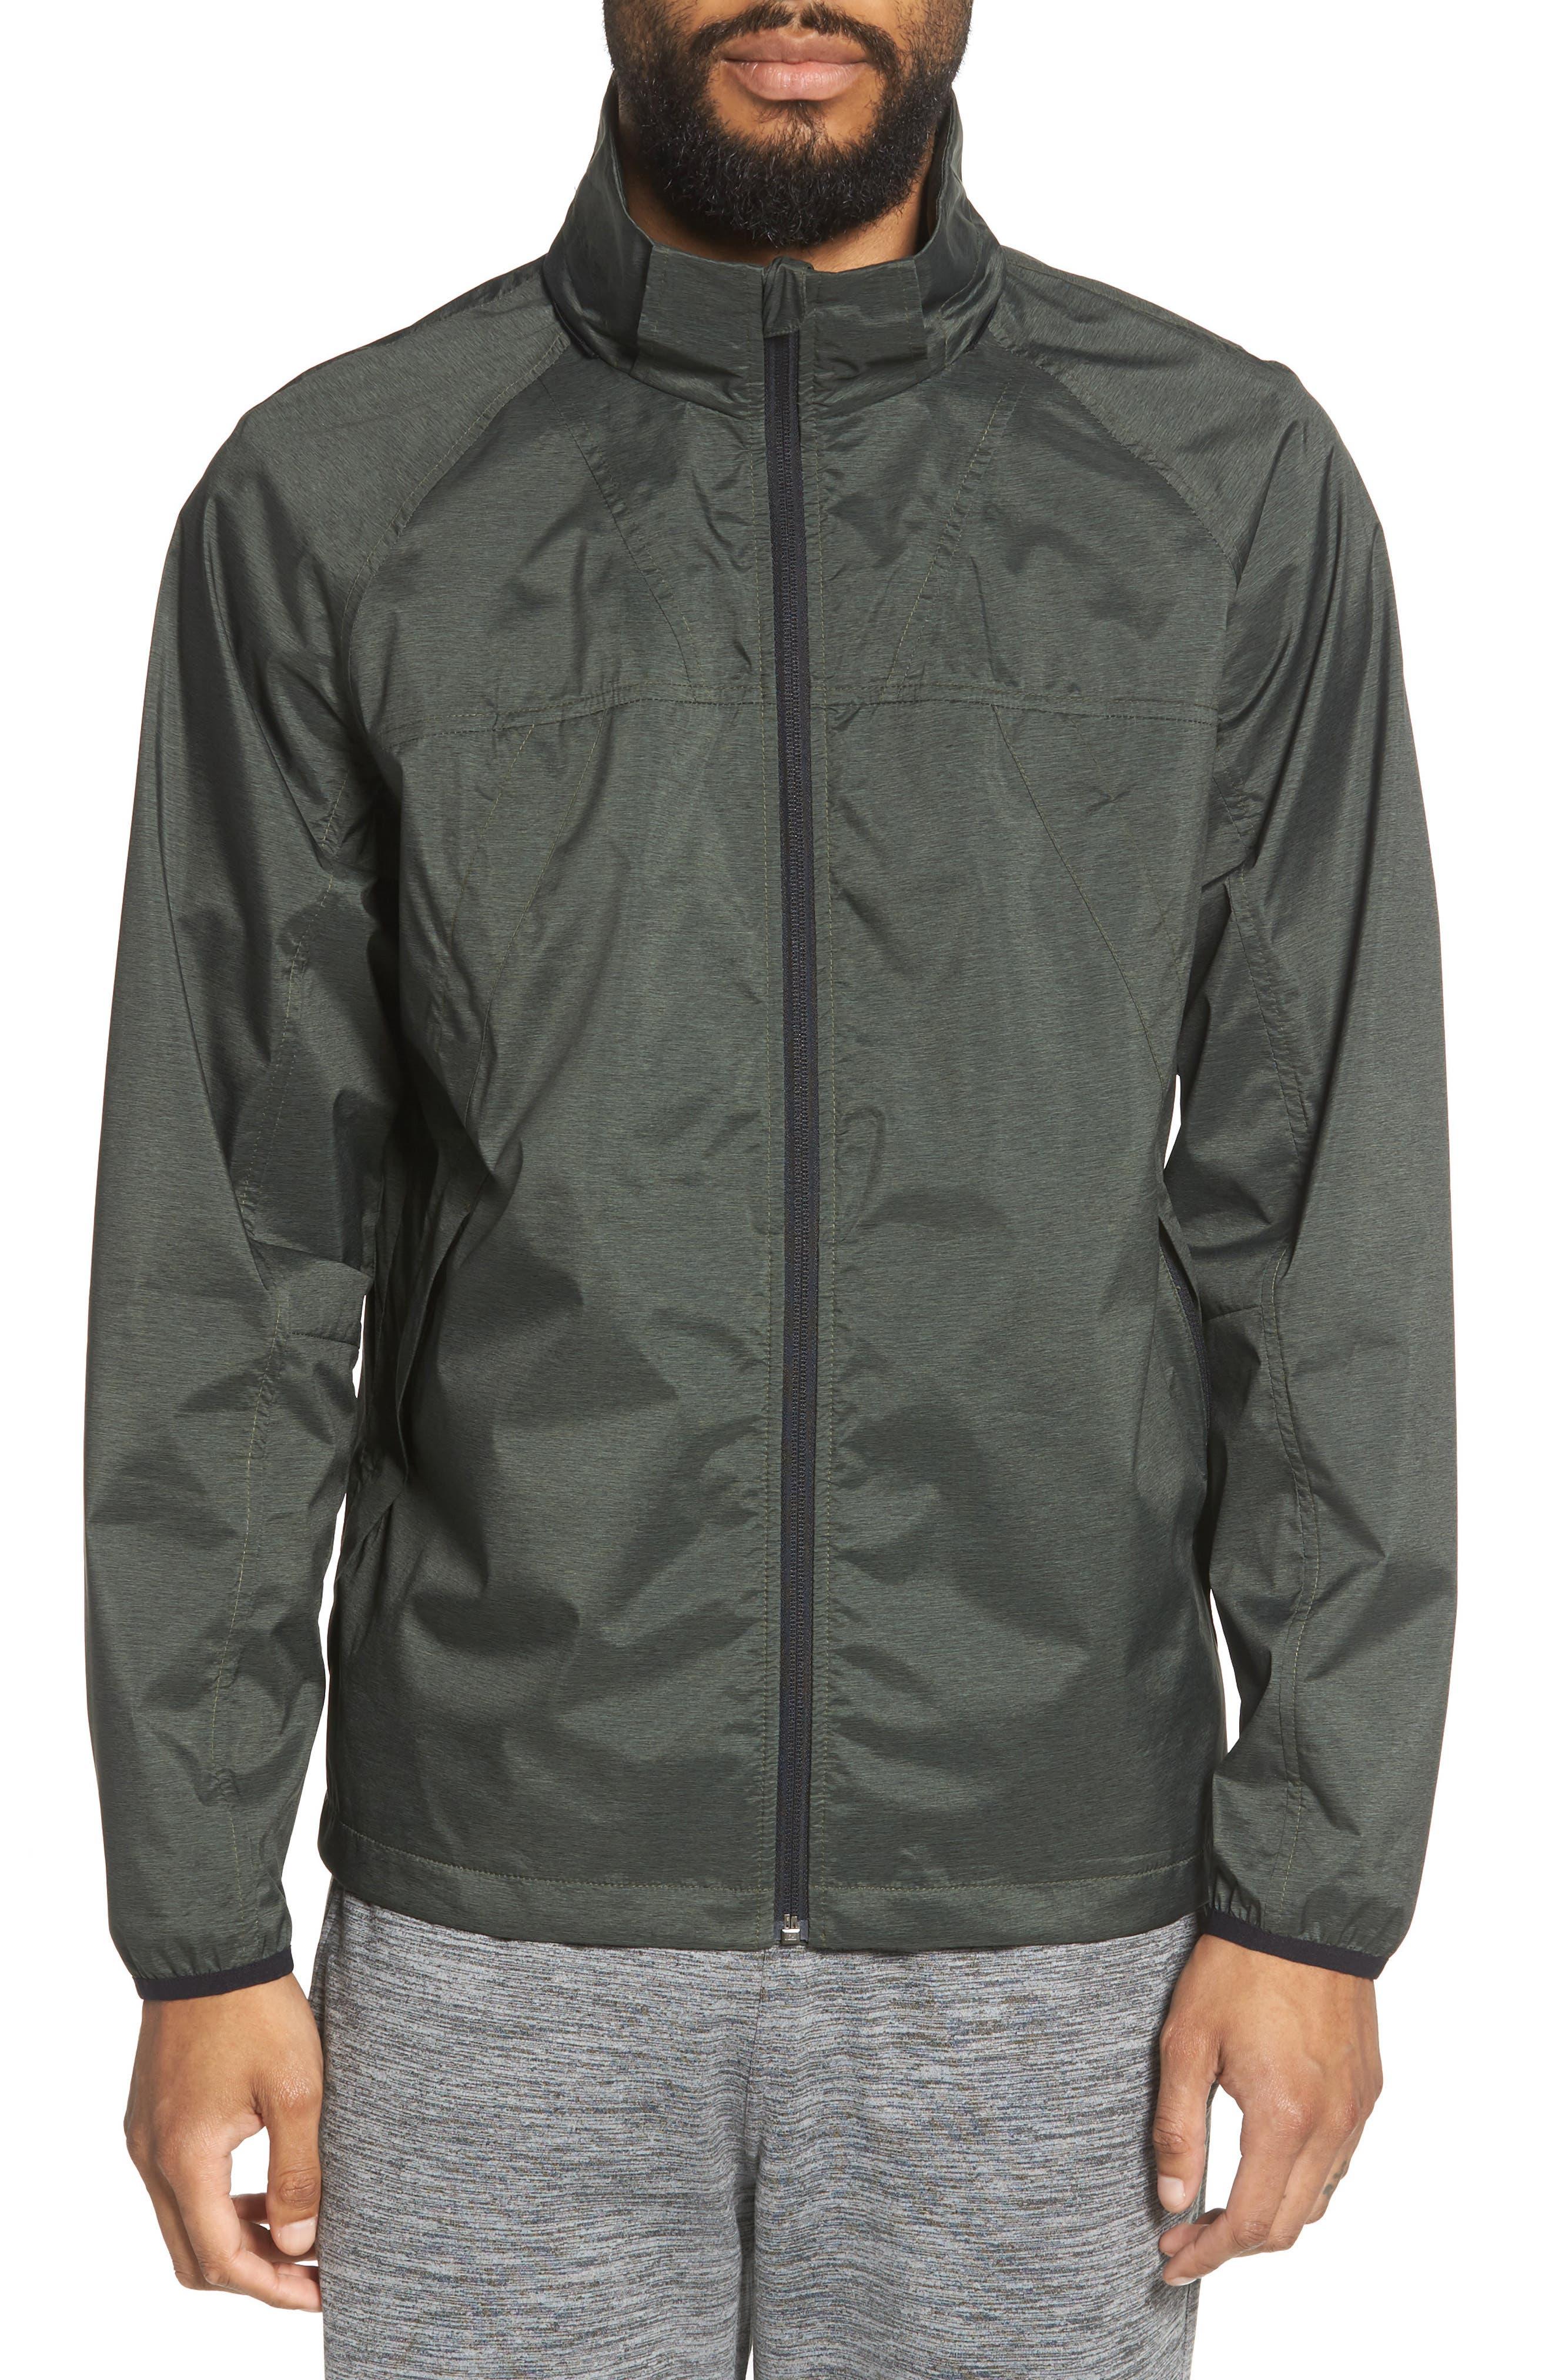 Xieite Hooded Jacket,                             Alternate thumbnail 4, color,                             GREEN TACTICAL MELANGE